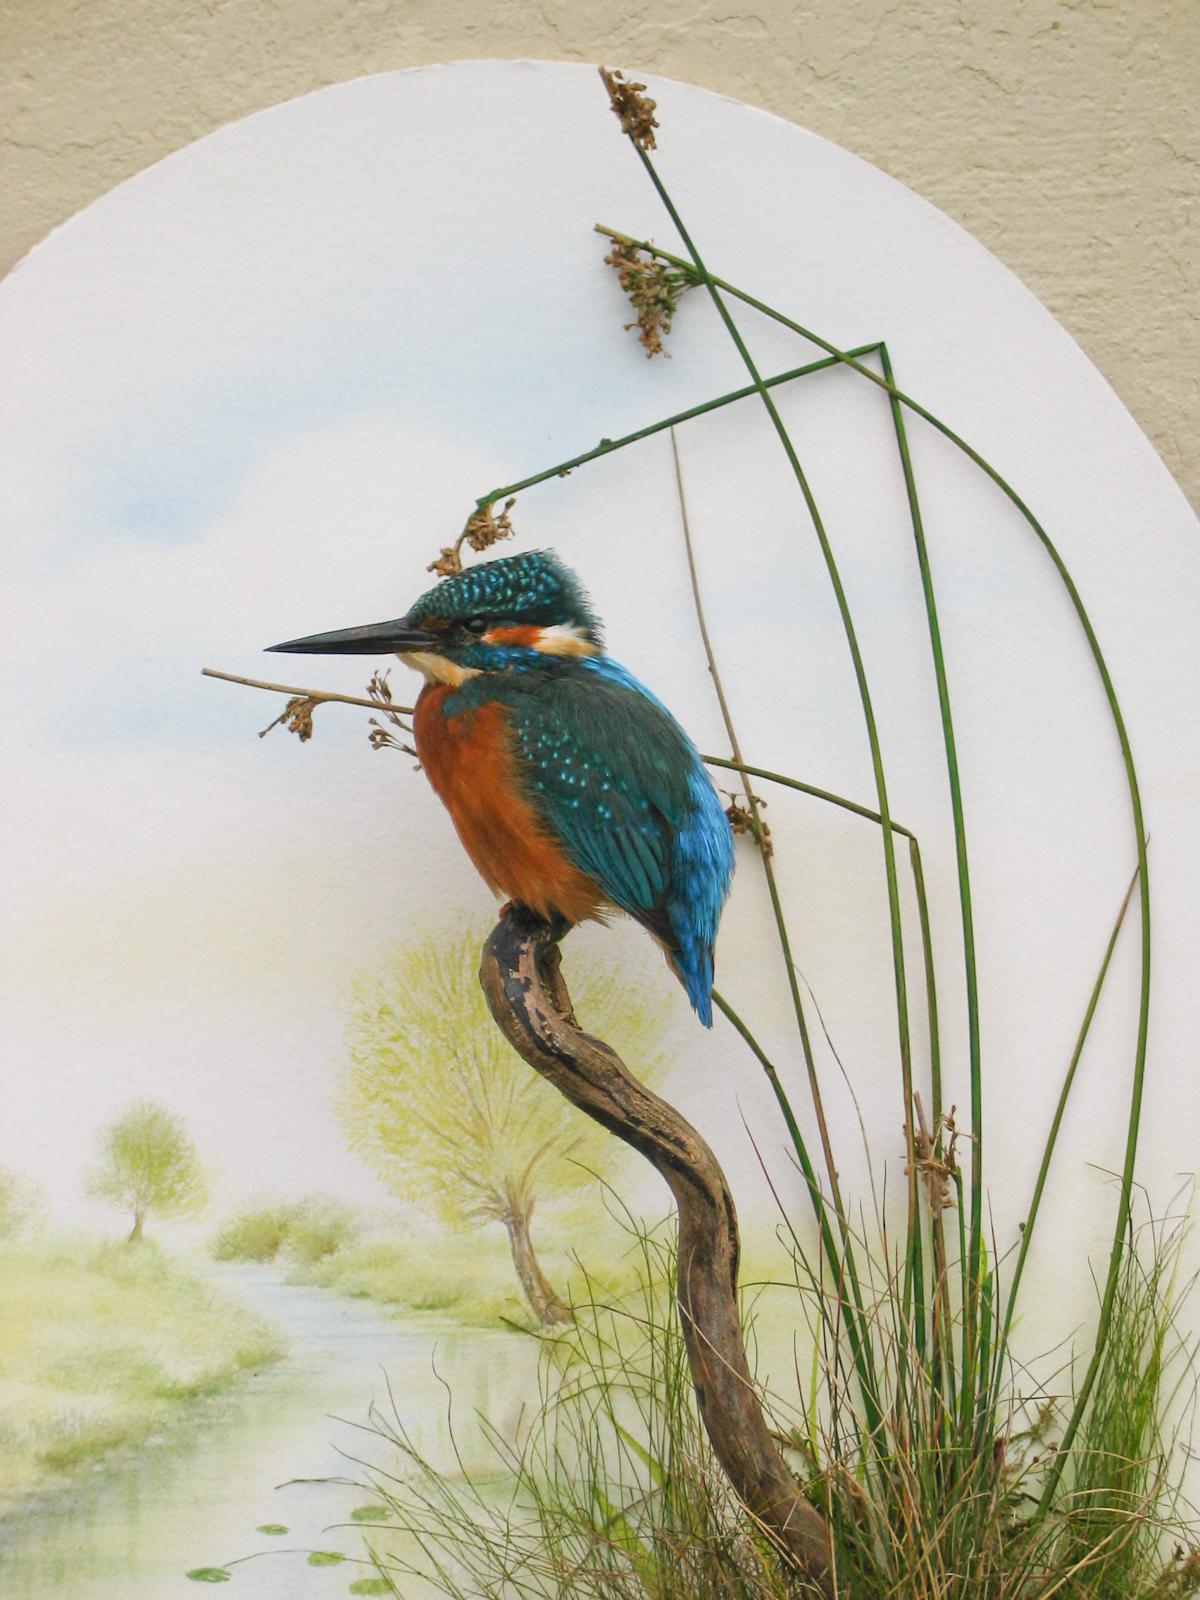 Kingfisher Bird Taxidermy By Mike Gadd